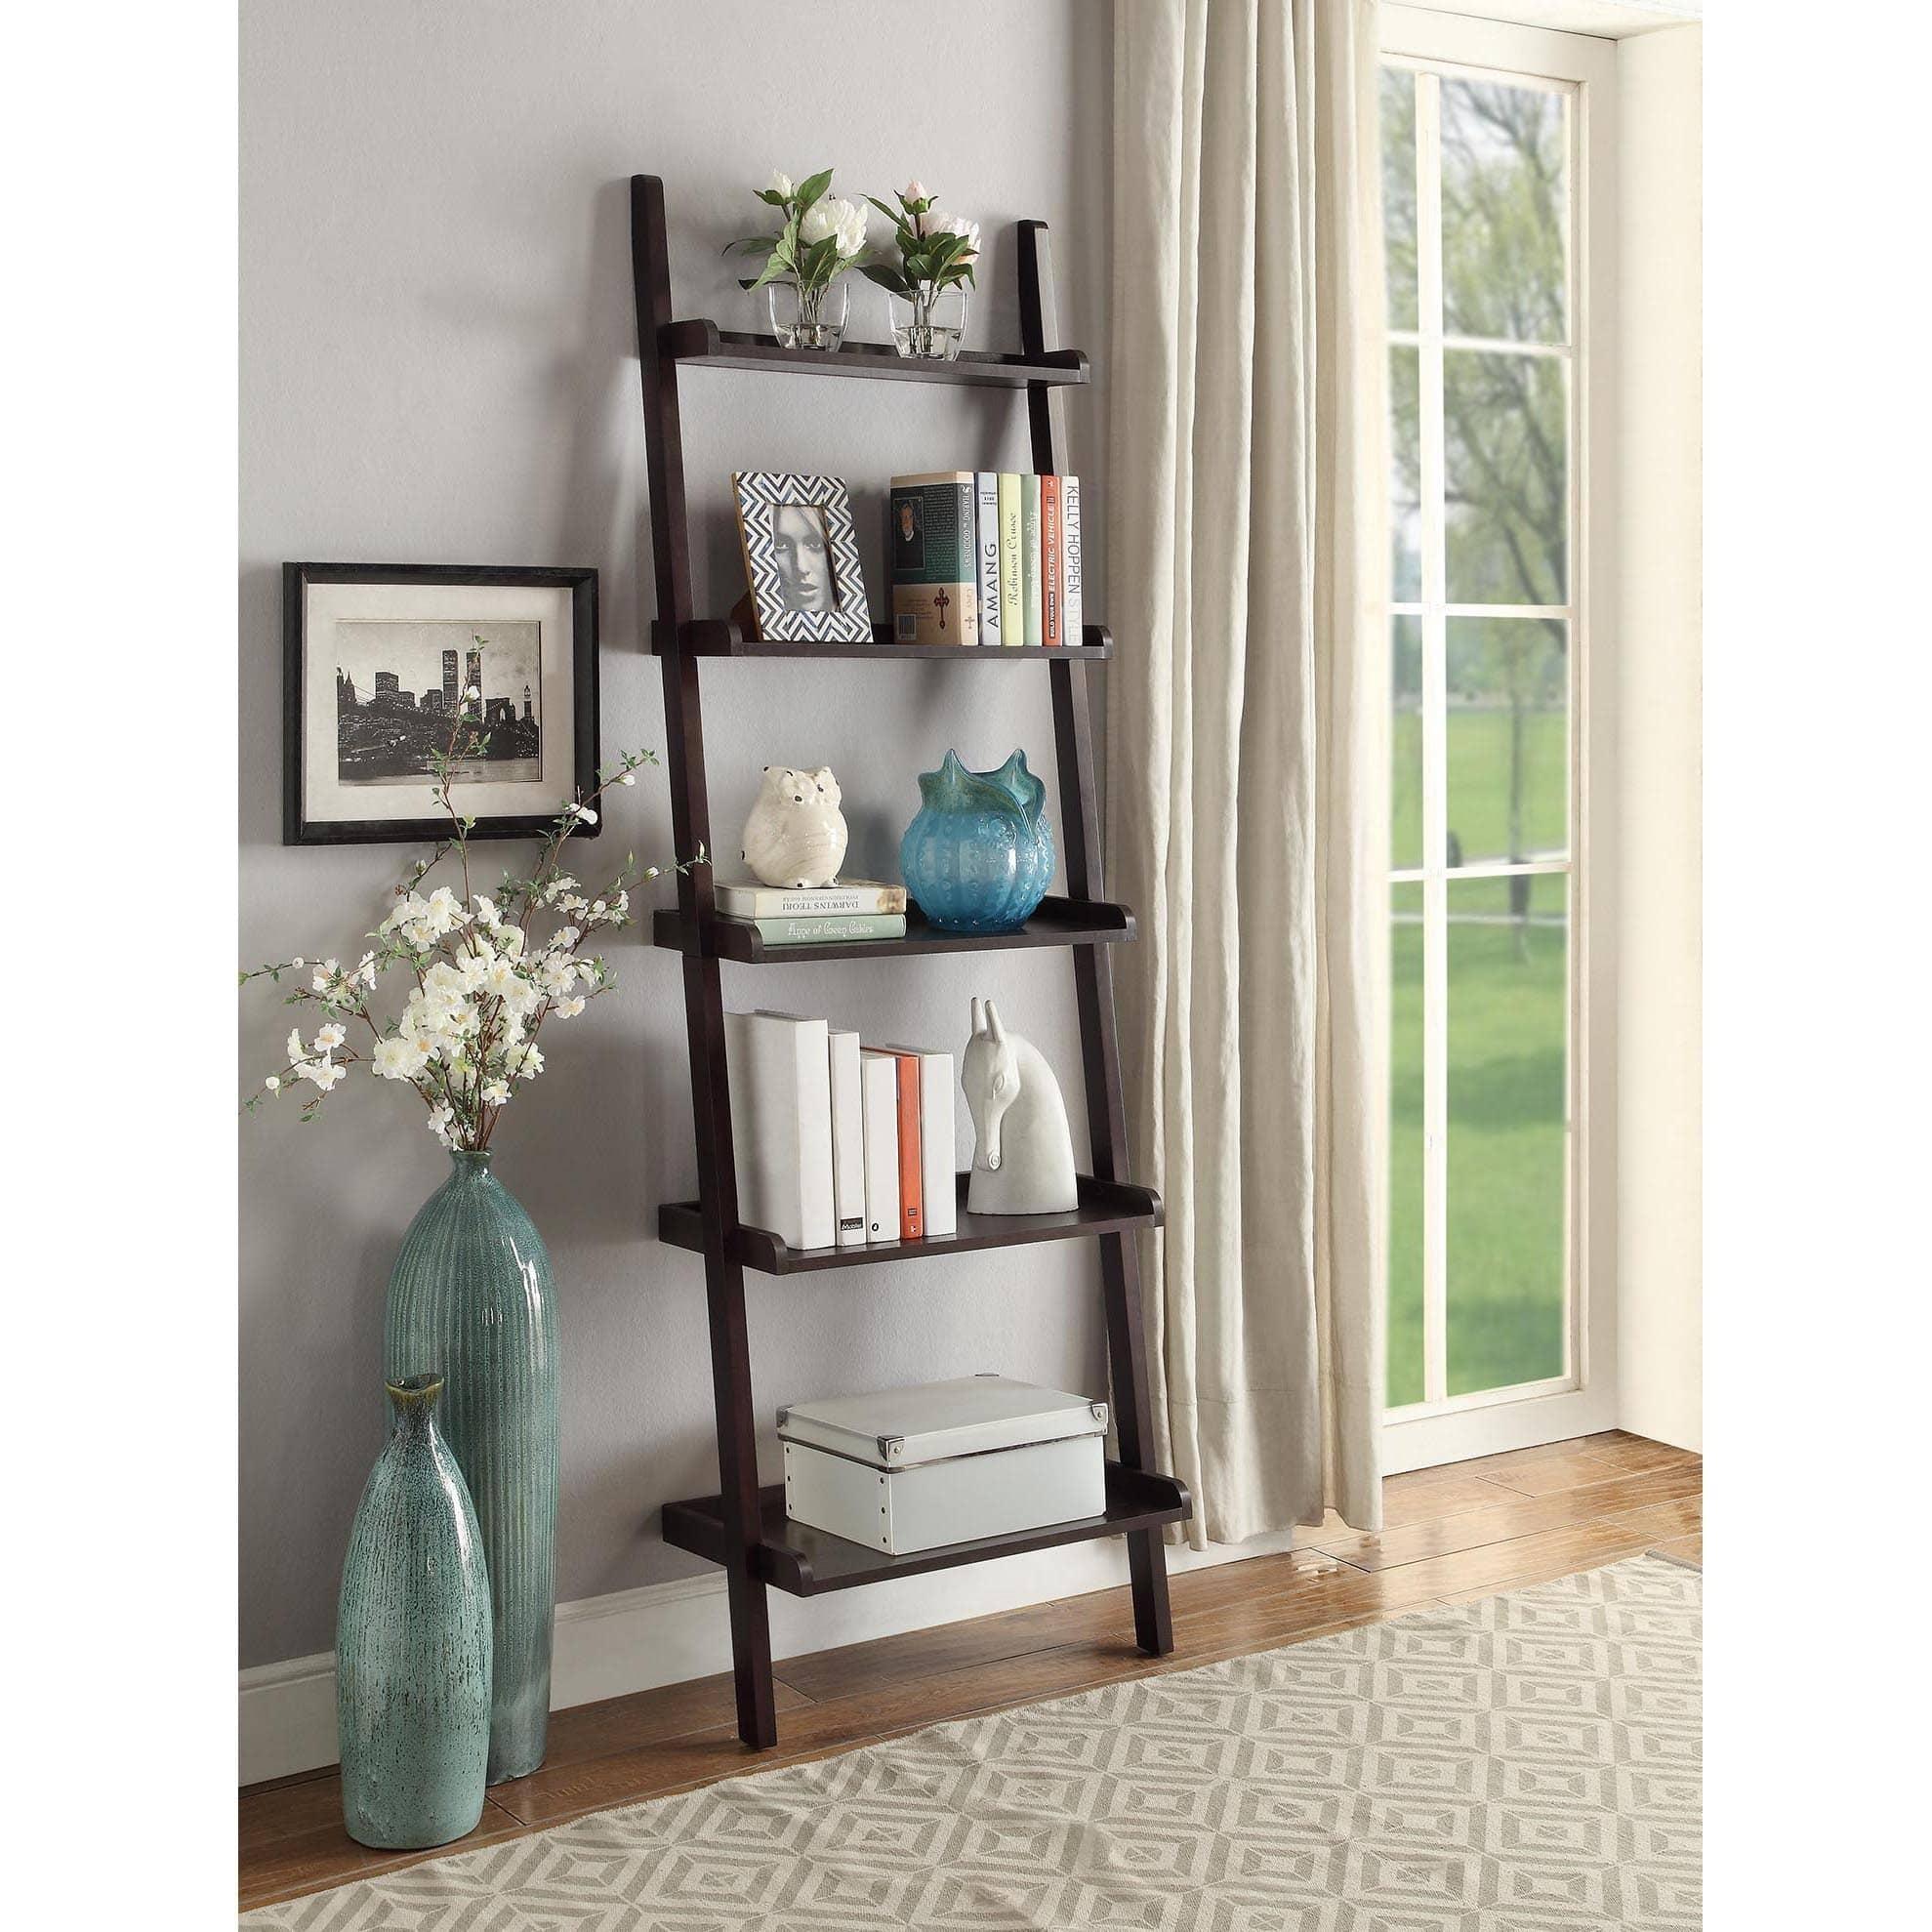 Buy Bookshelves & Bookcases Online At Overstock